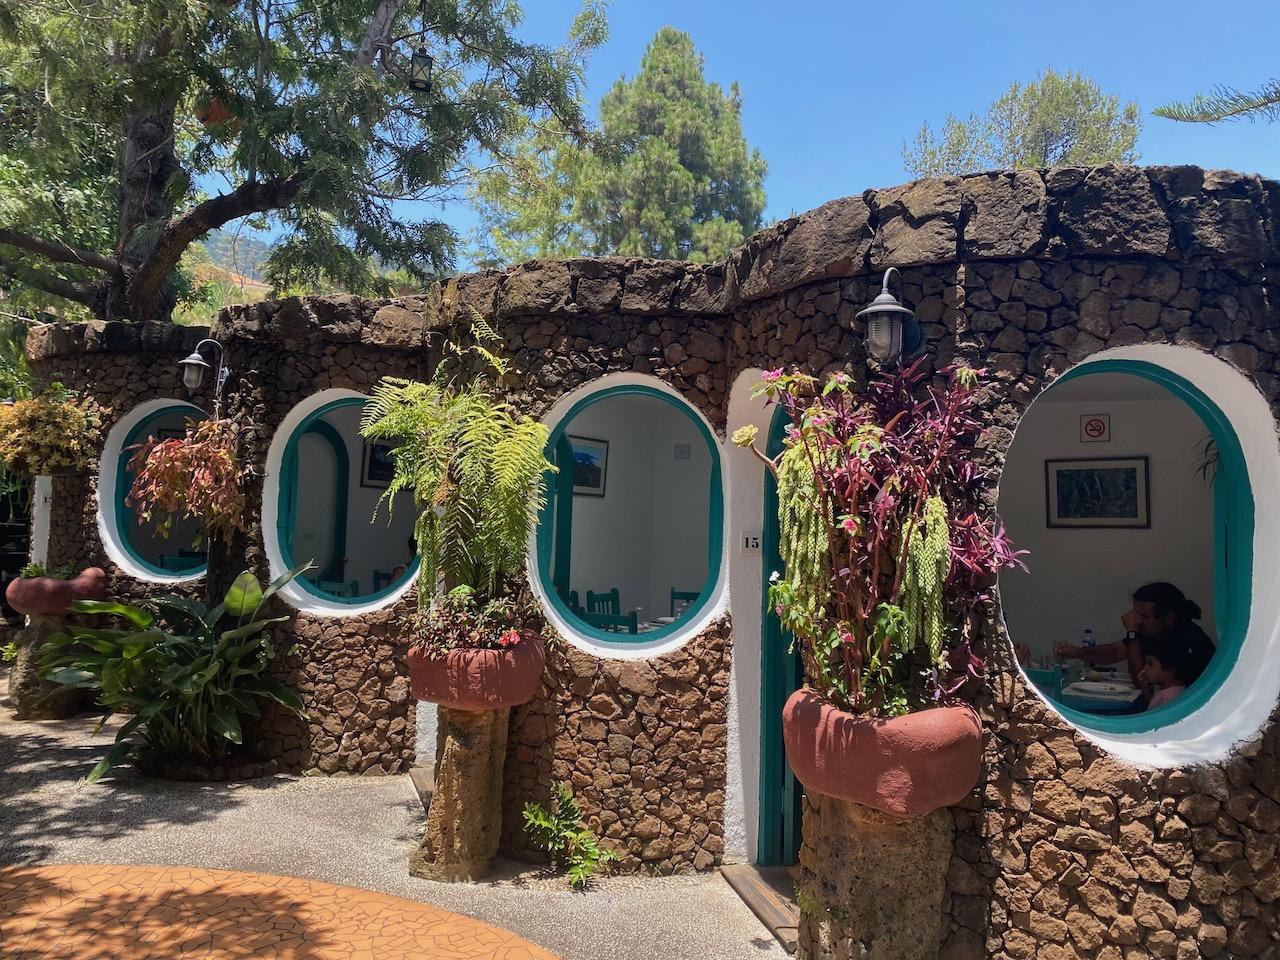 Unusual dining rooms at Chipi Chipi